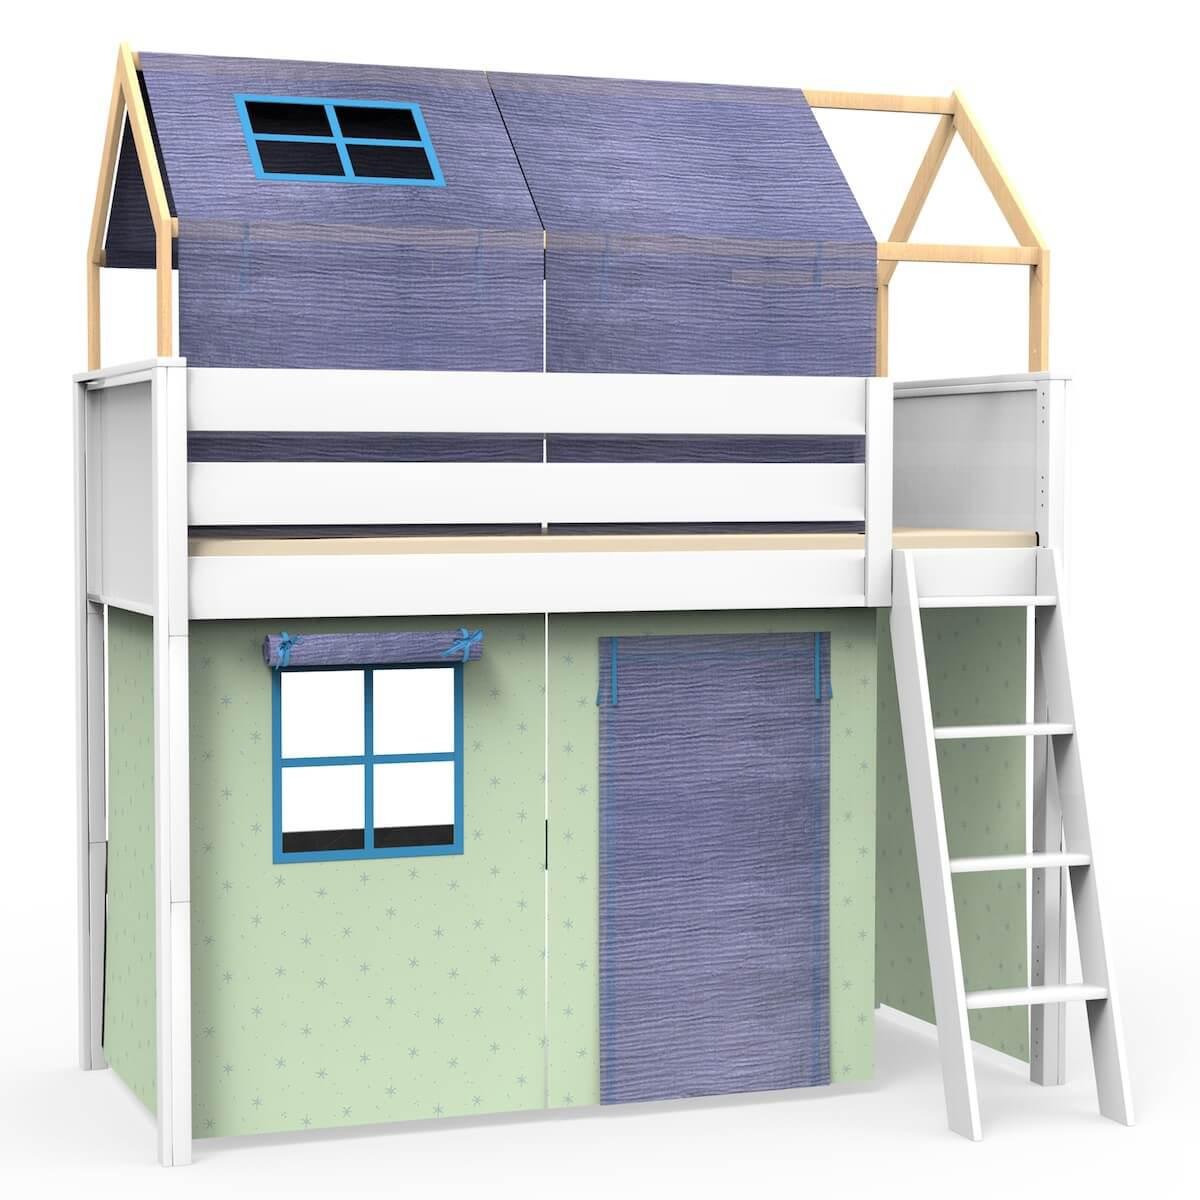 Hochbett-Dach hoch KASVA mit Textilien Bobble green-blue